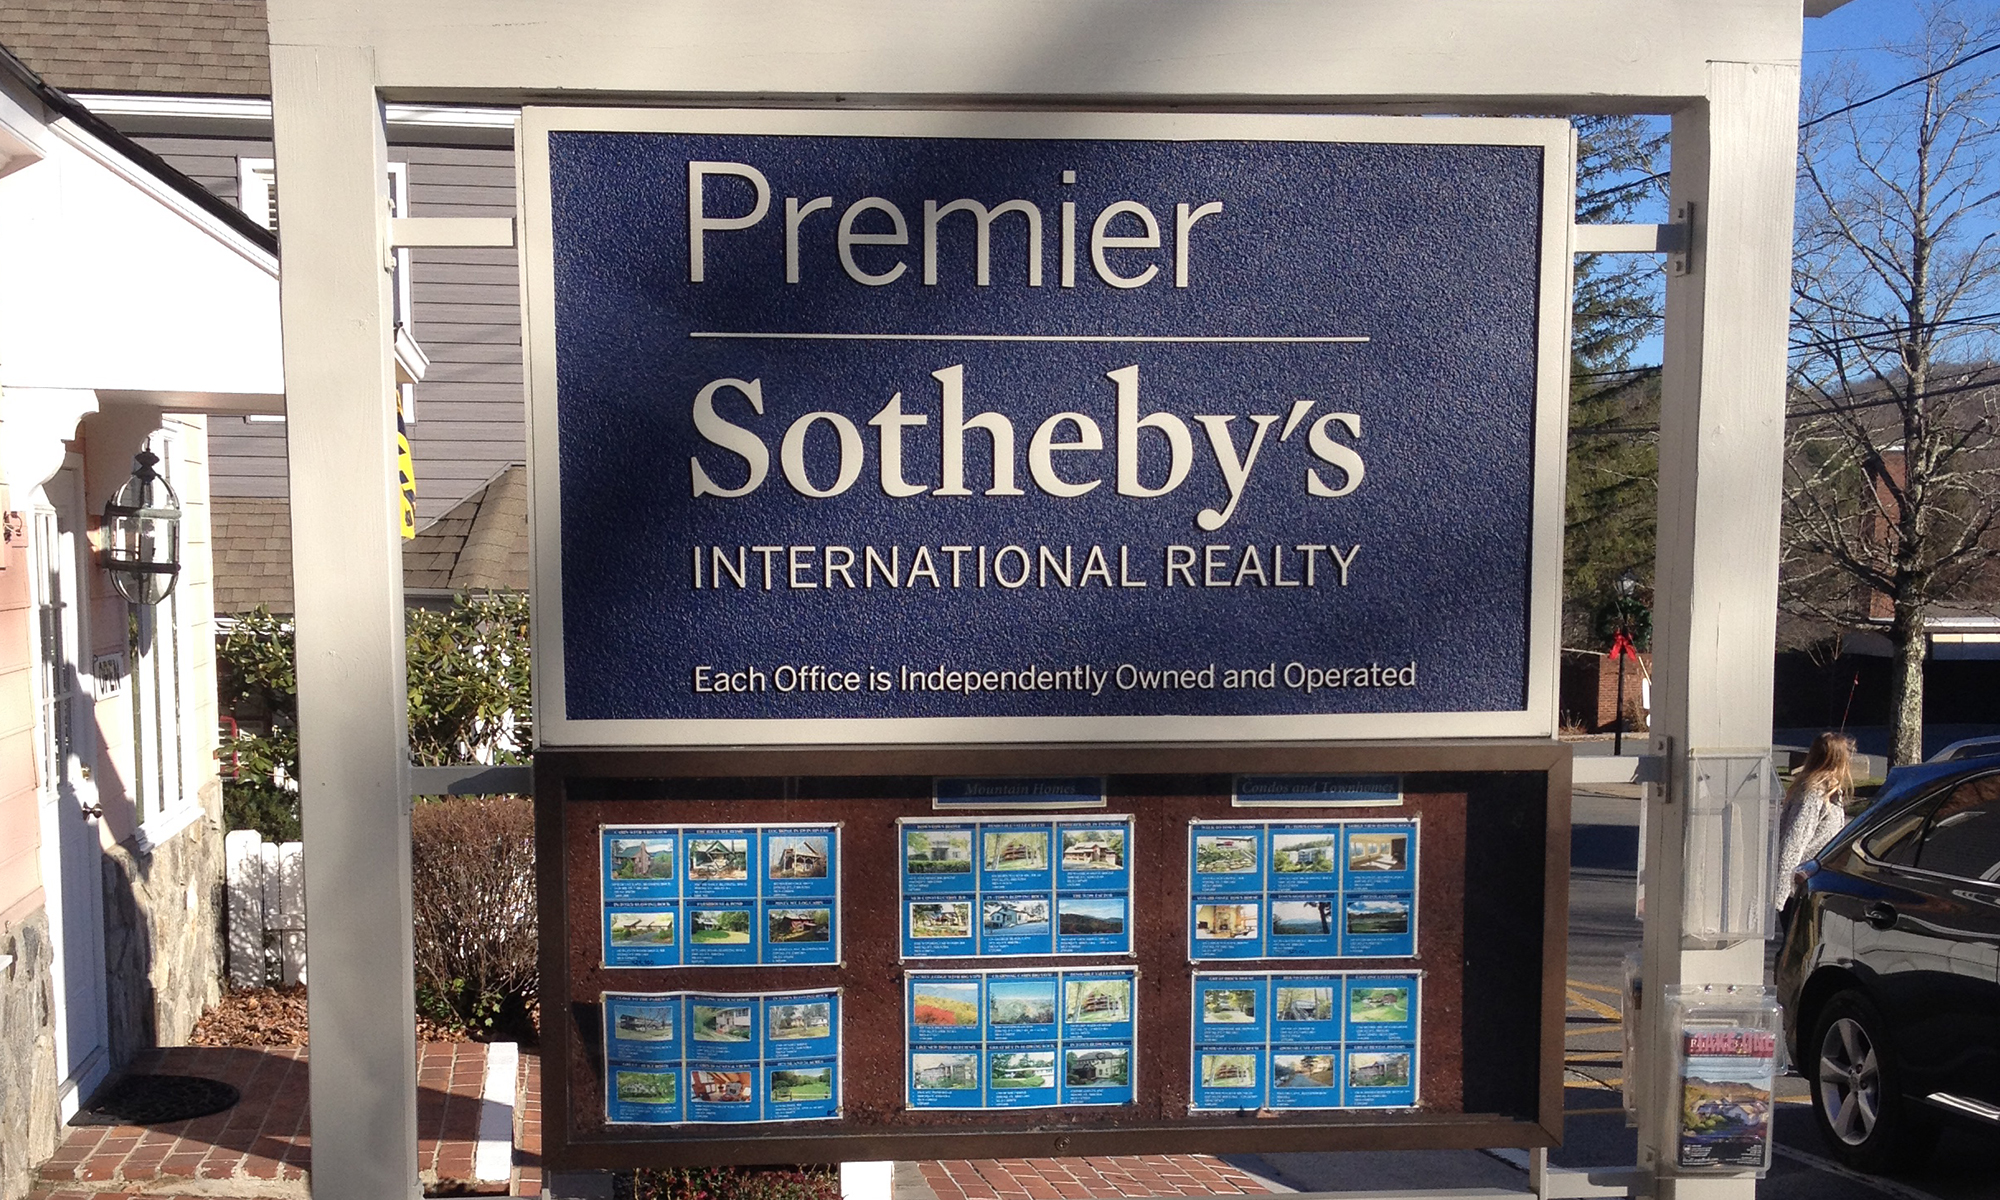 Premier Sotheby's International Realty Blowing Rock